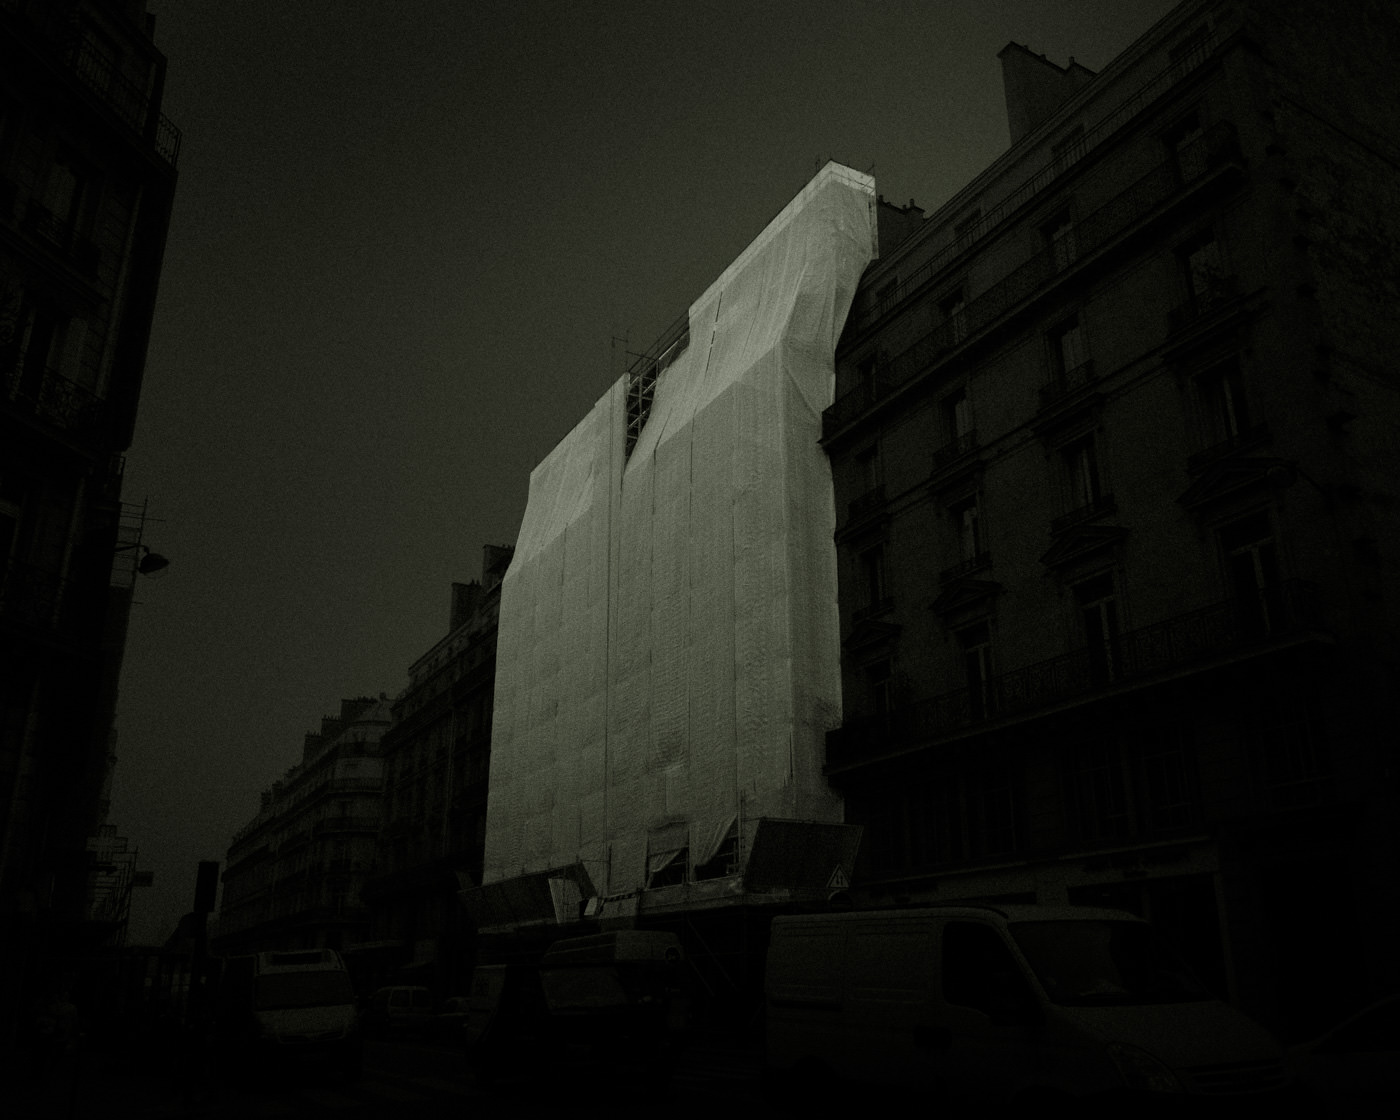 """Monday, 04:51"" from the series Nylon Chrysalis, by William Mokrynski"